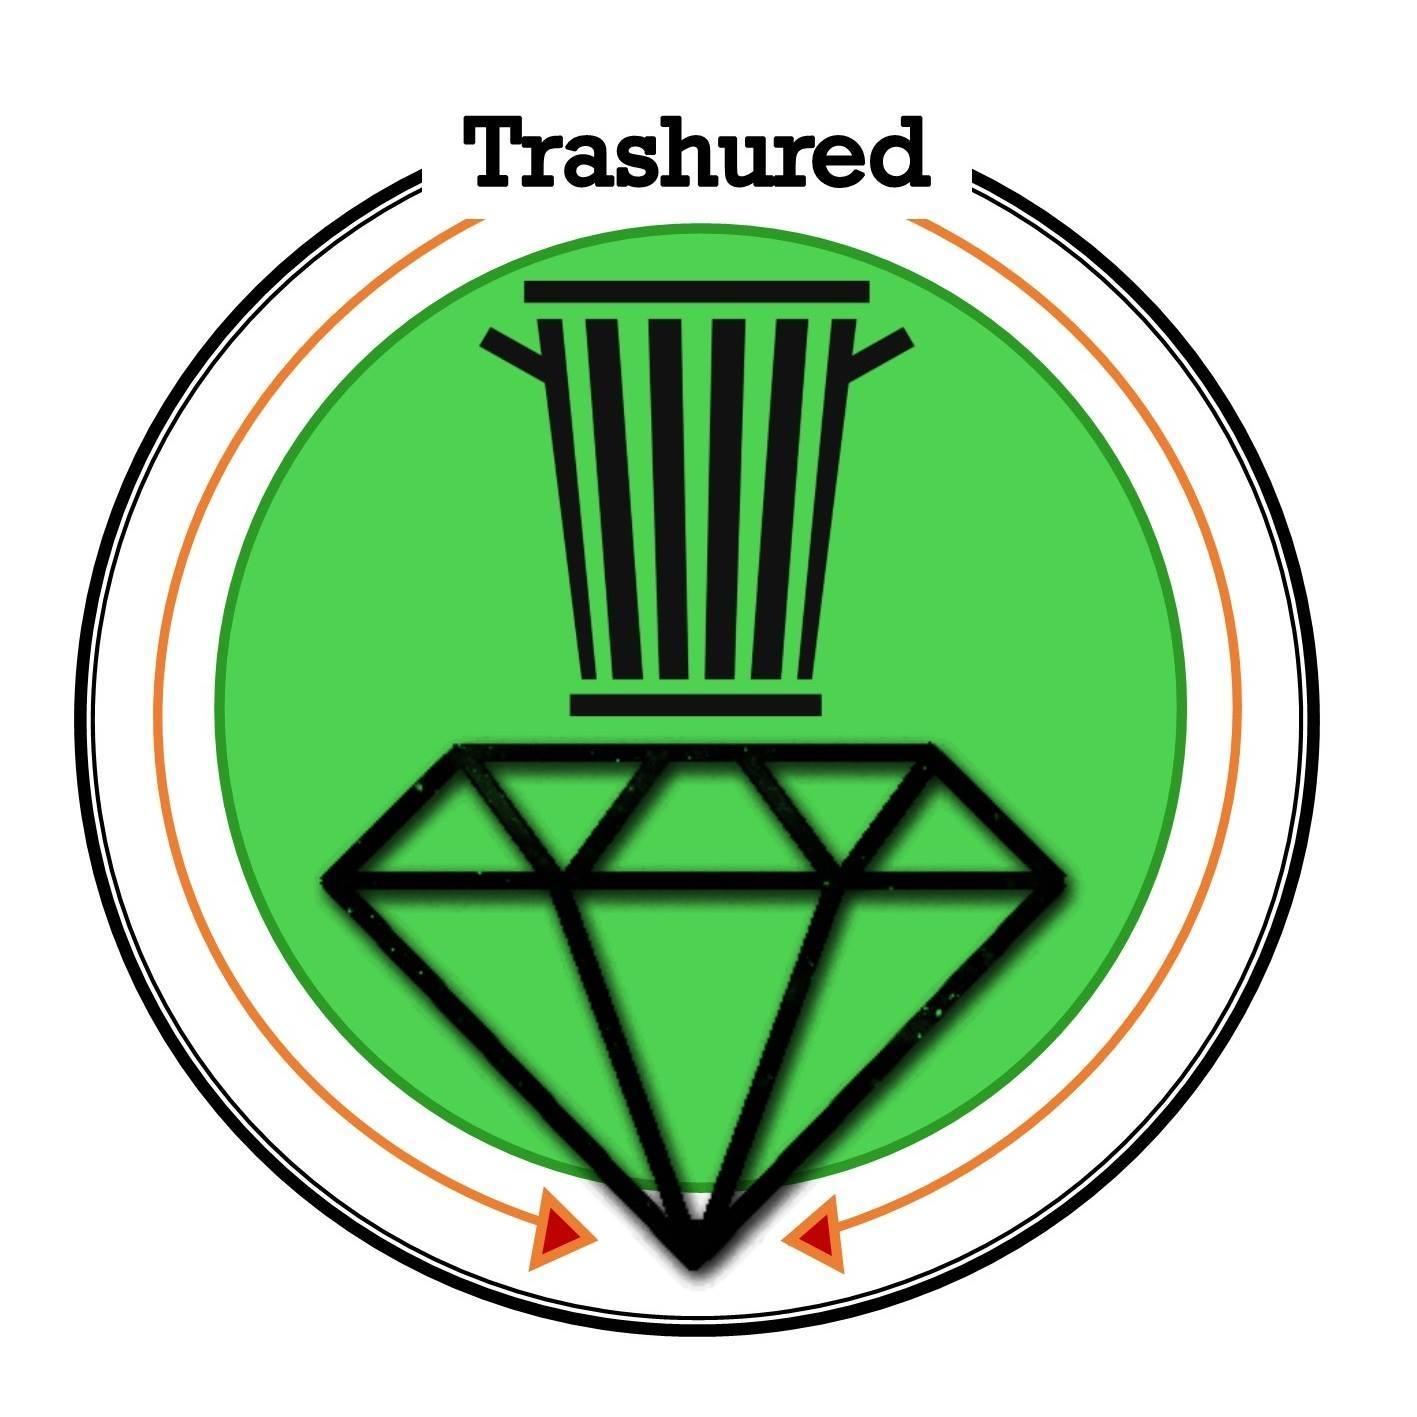 Trashured